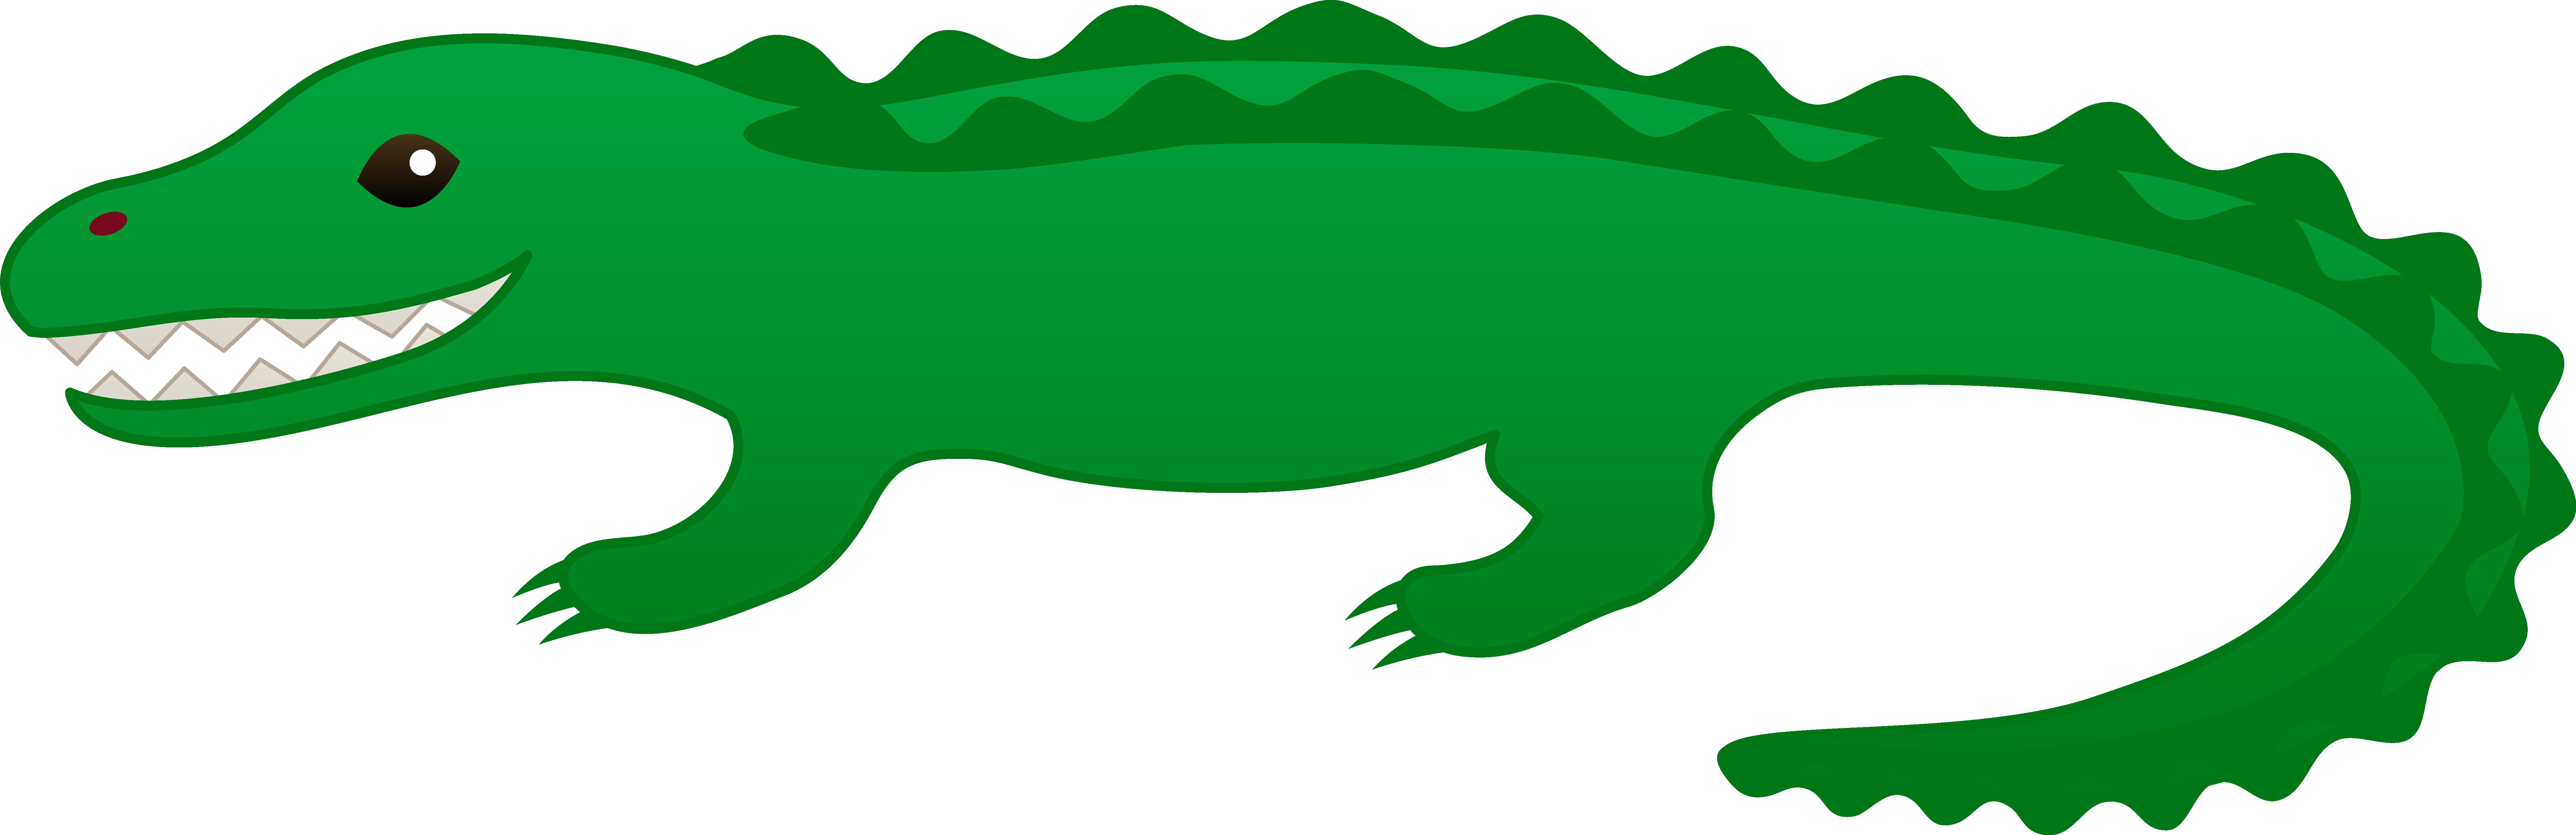 8491x2753 Top 75 Crocodile Clip Art